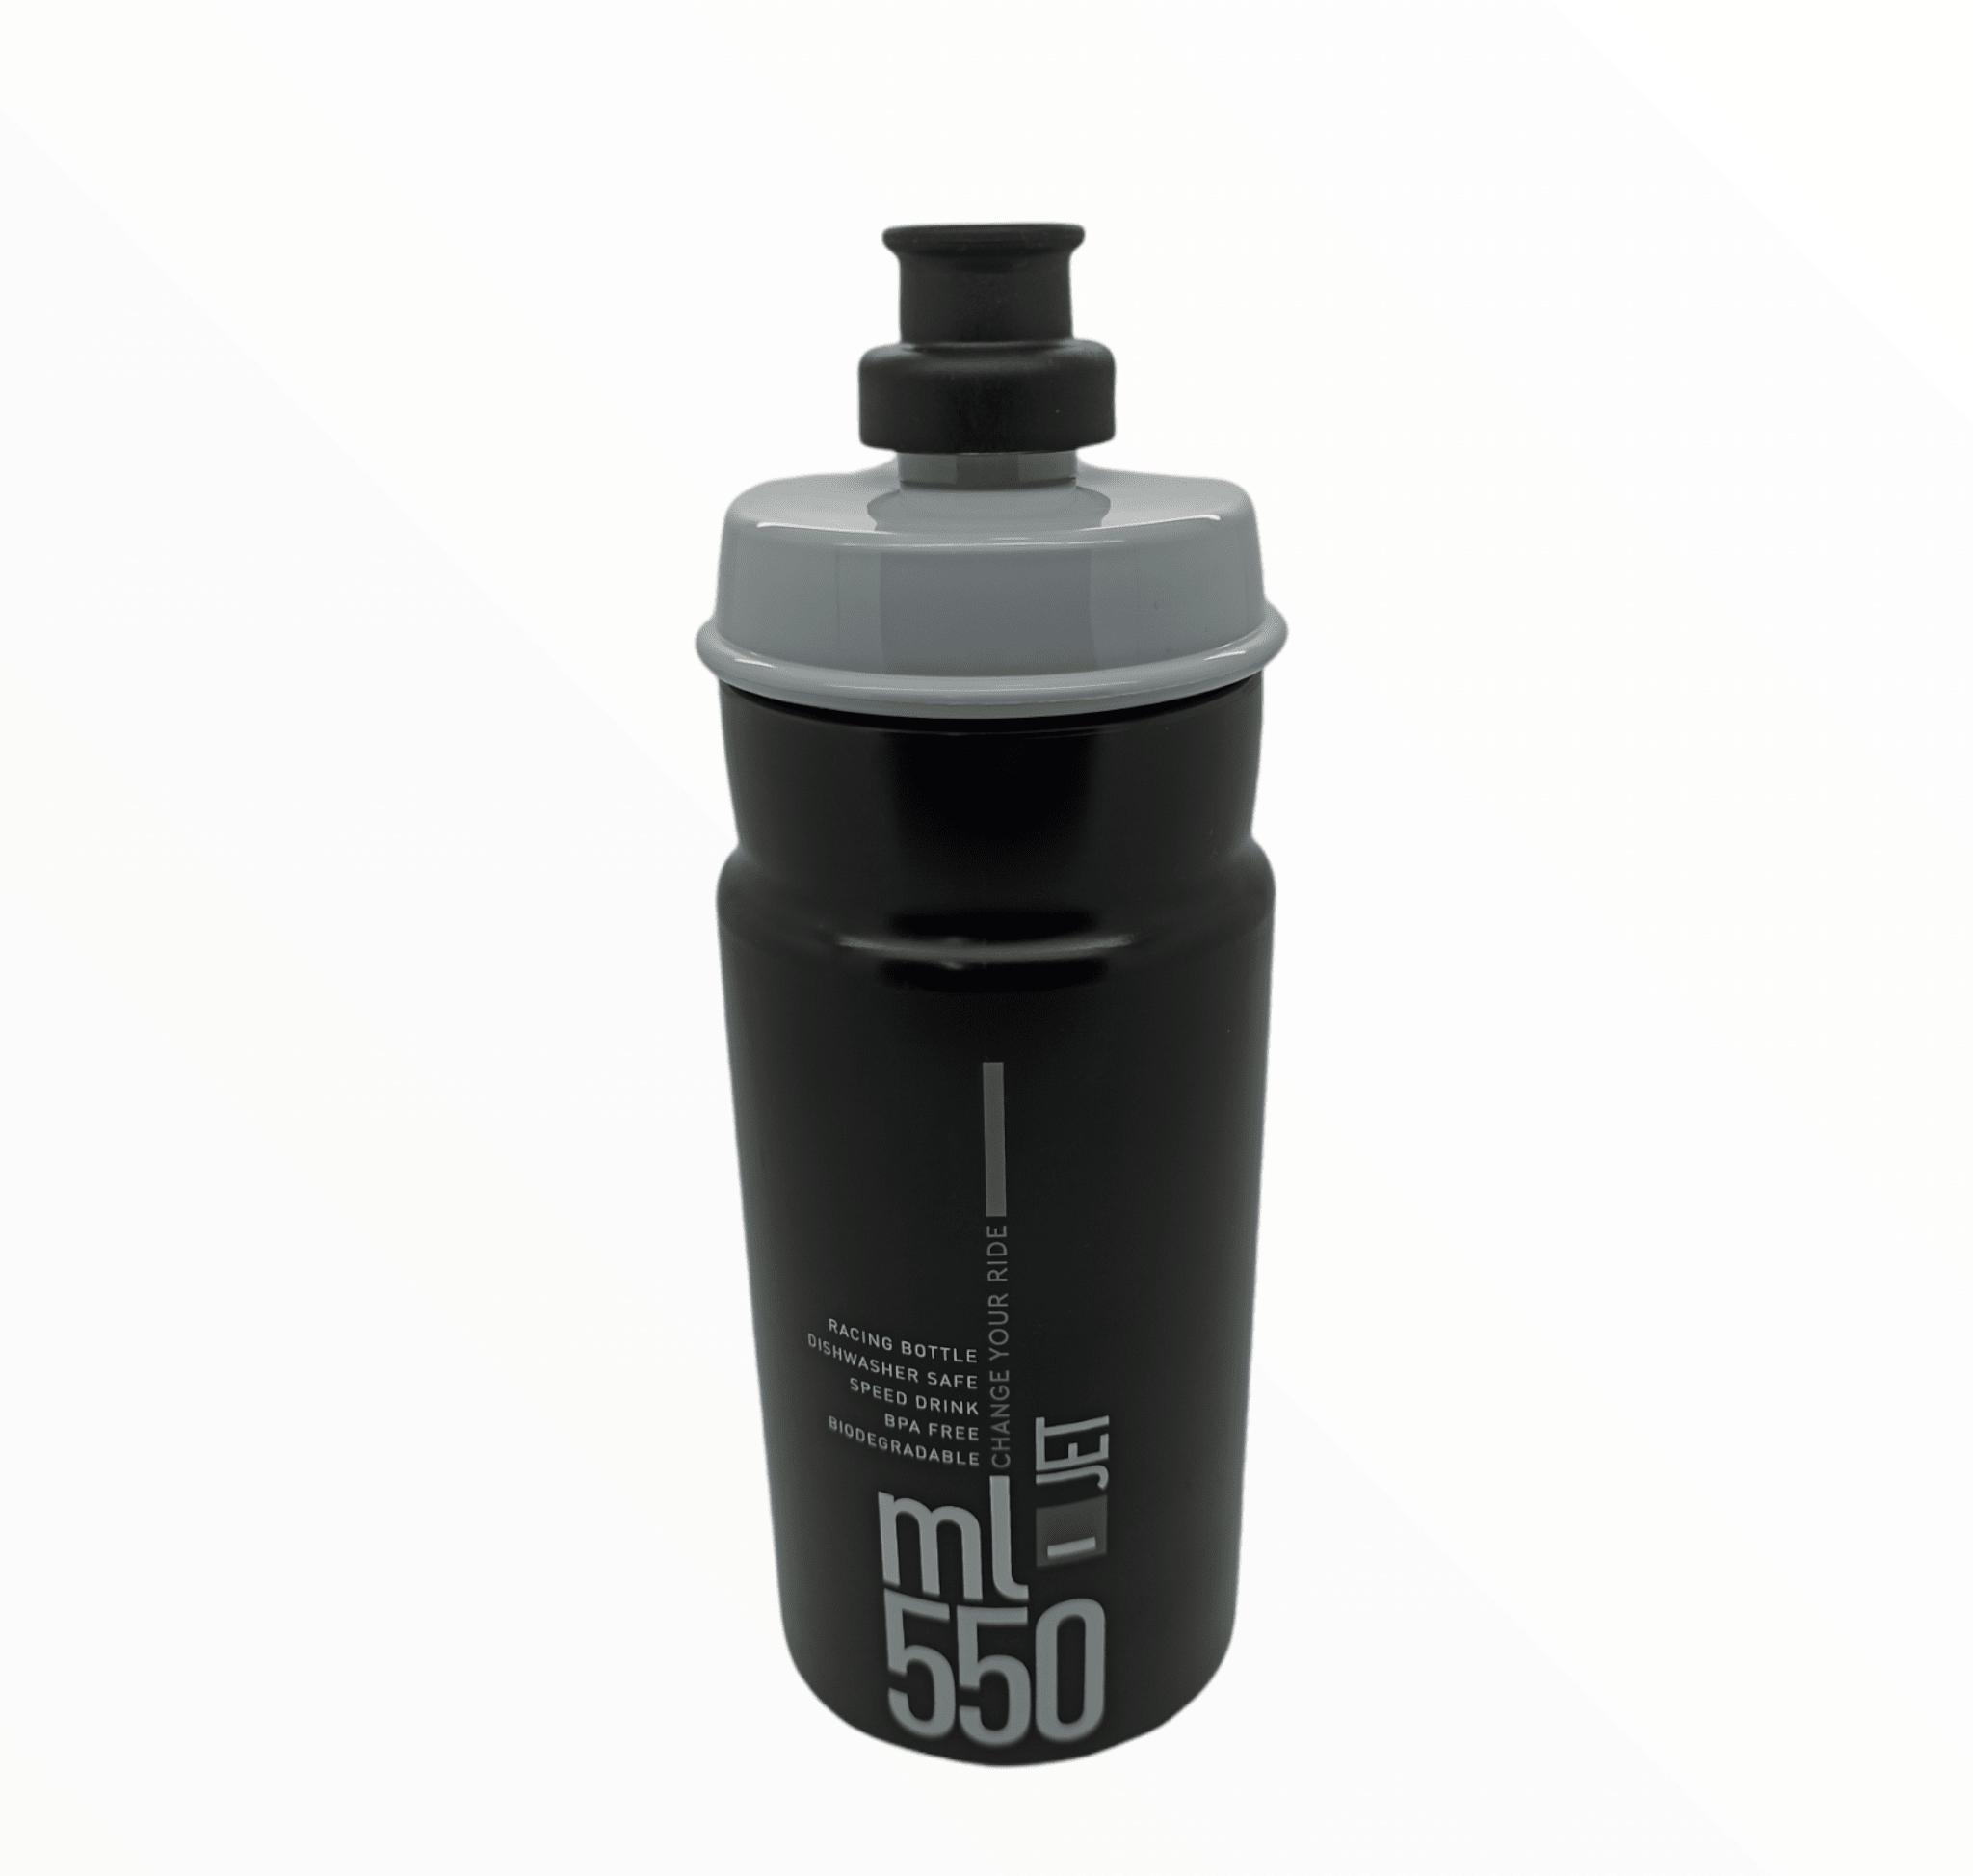 Caramagiola Elite Jet 550 ml